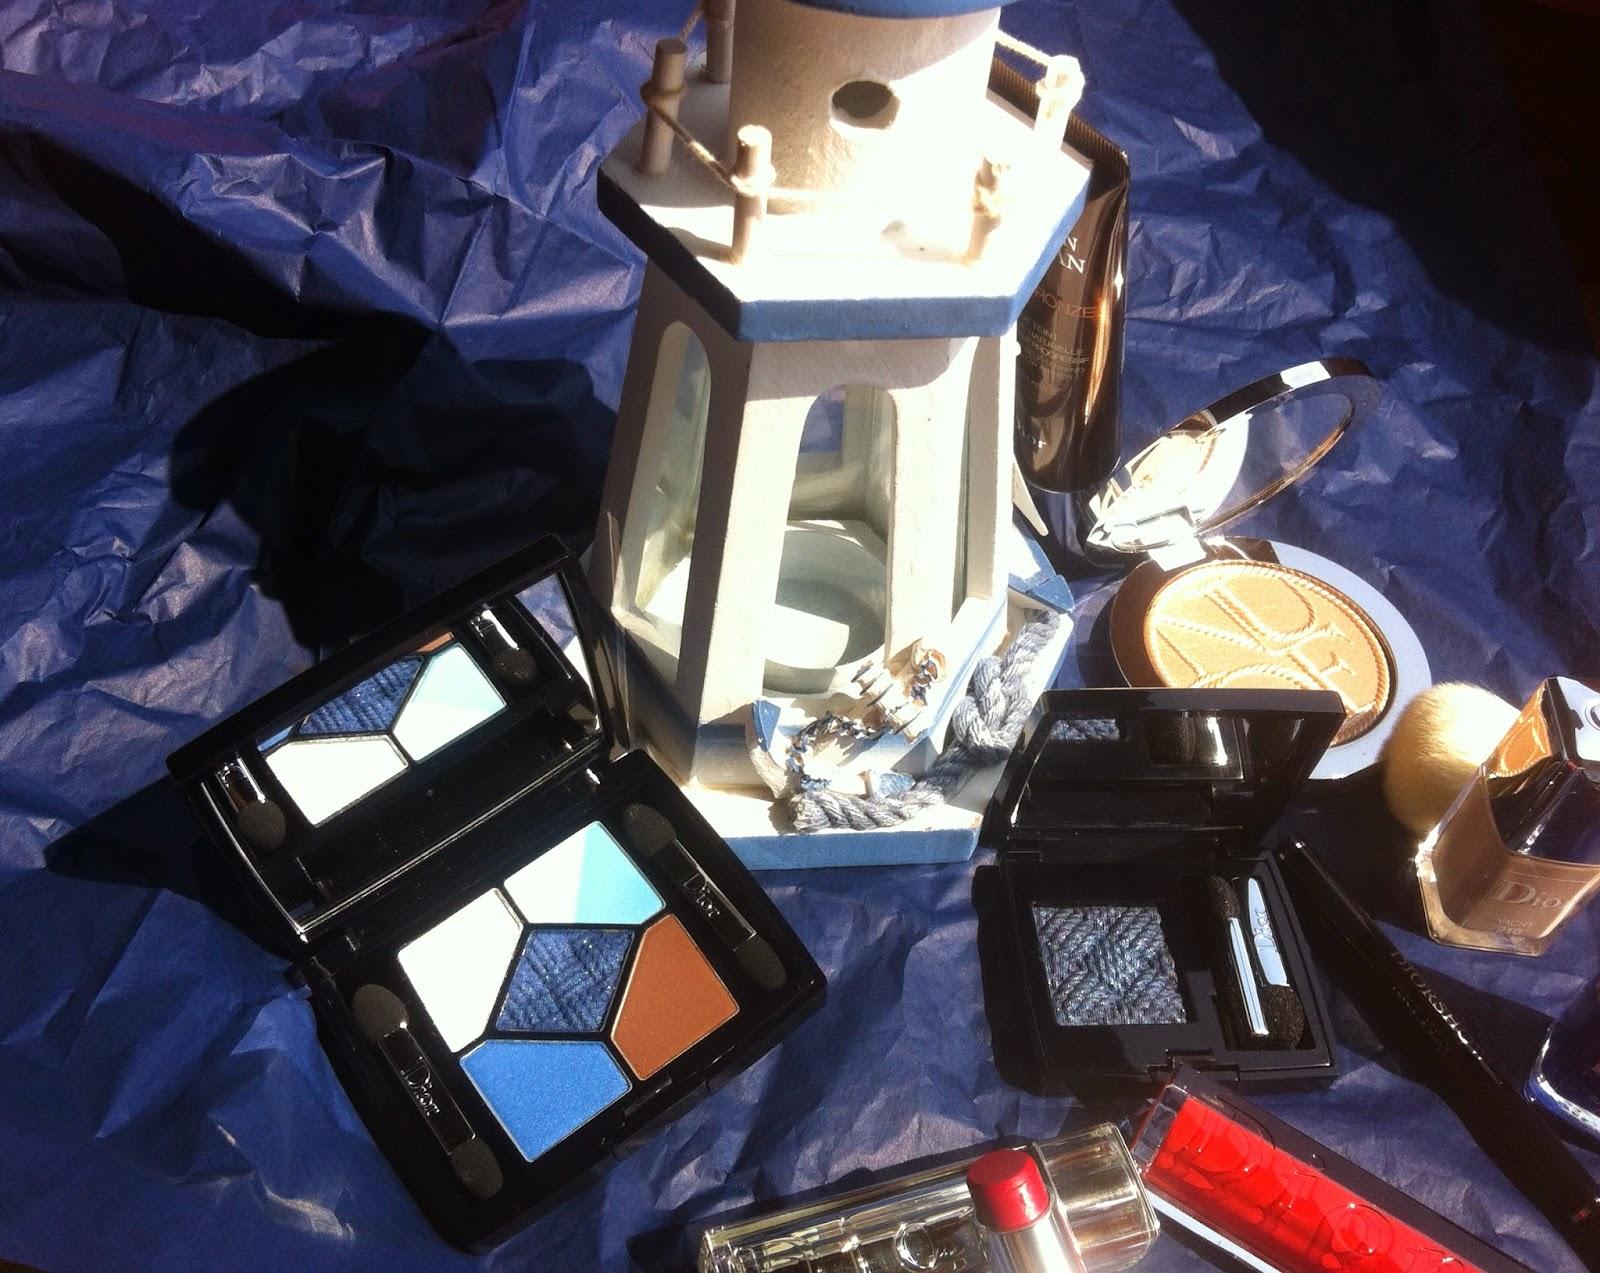 Dior Make Up Summer 2014 Transat collezione estate